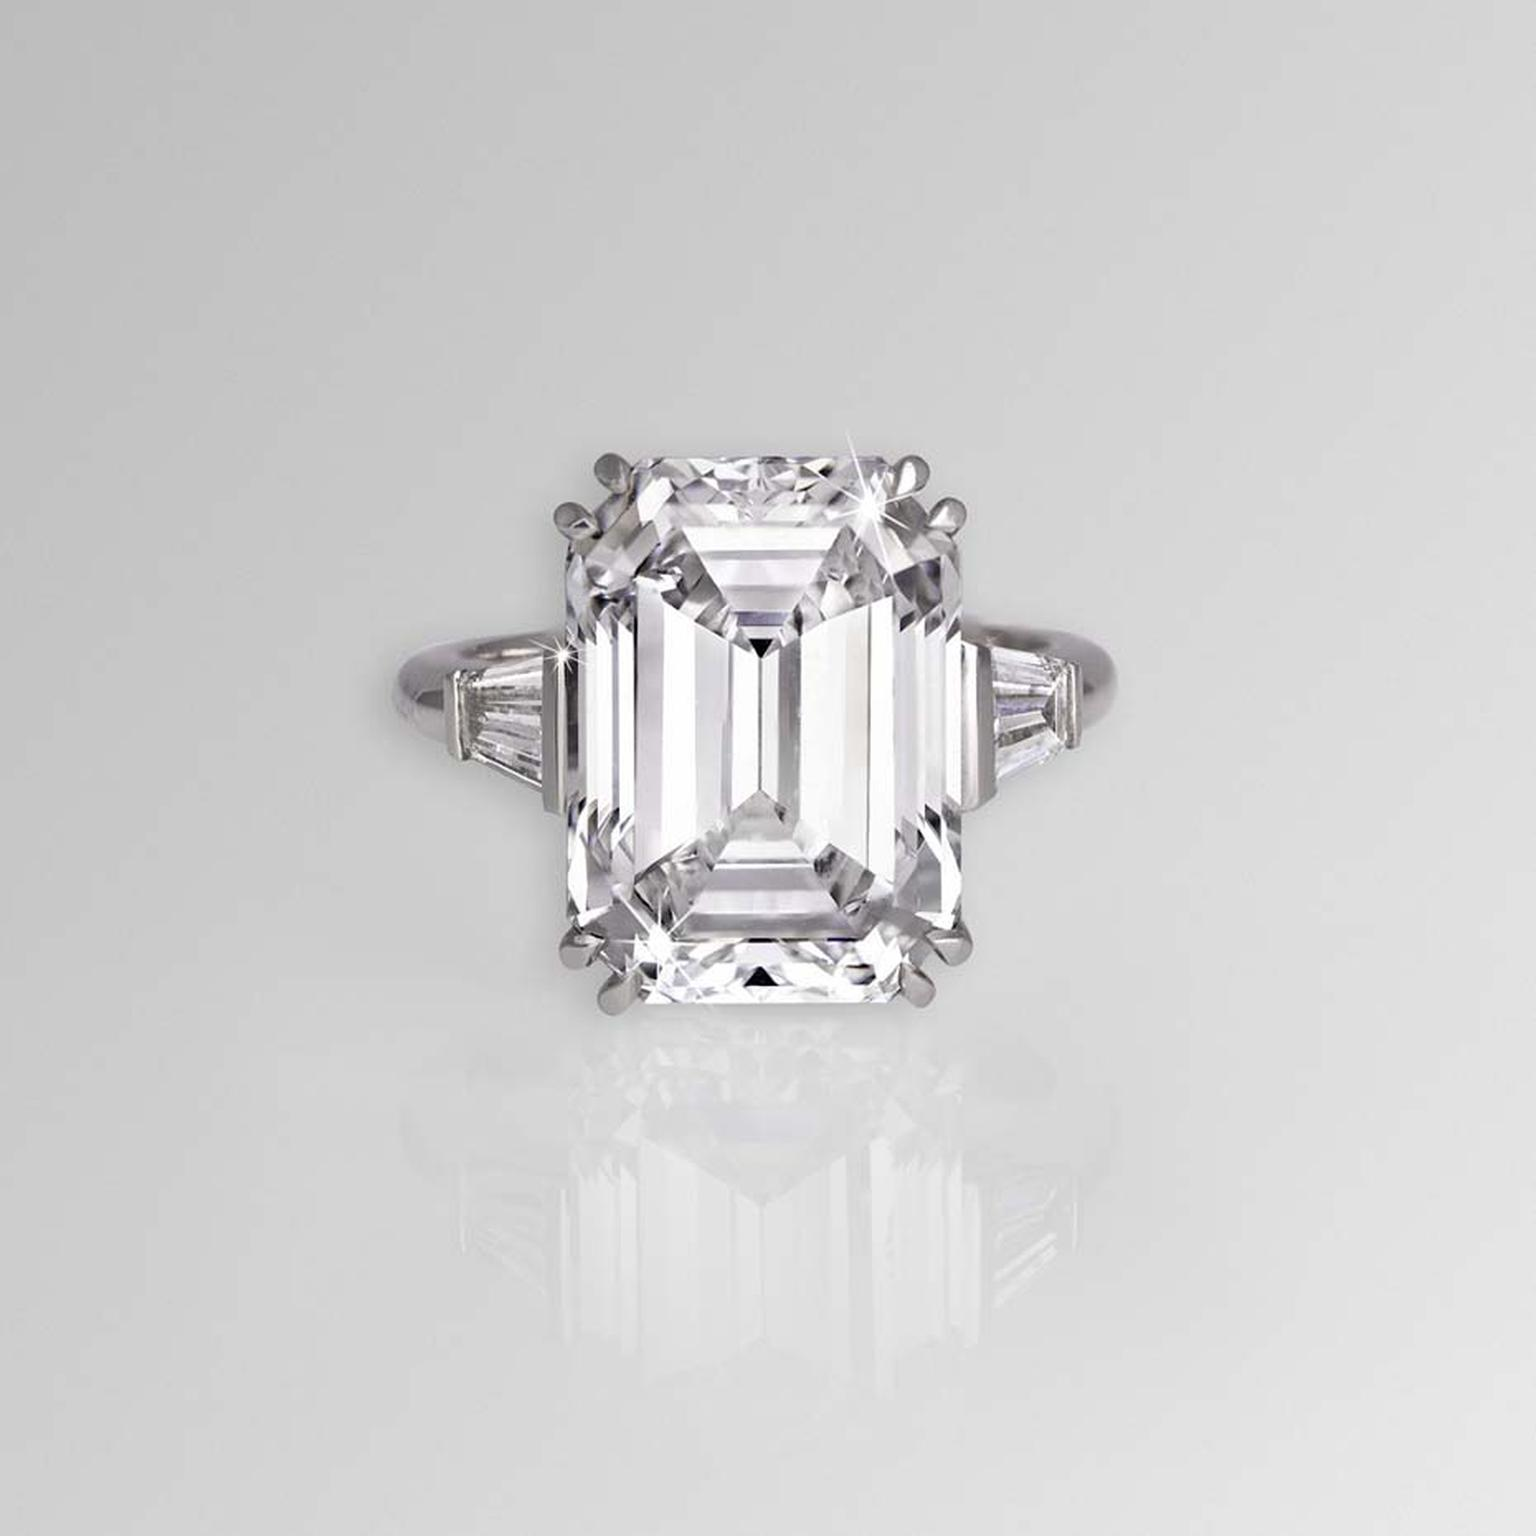 most beautiful emerald cut diamond ings in the world the